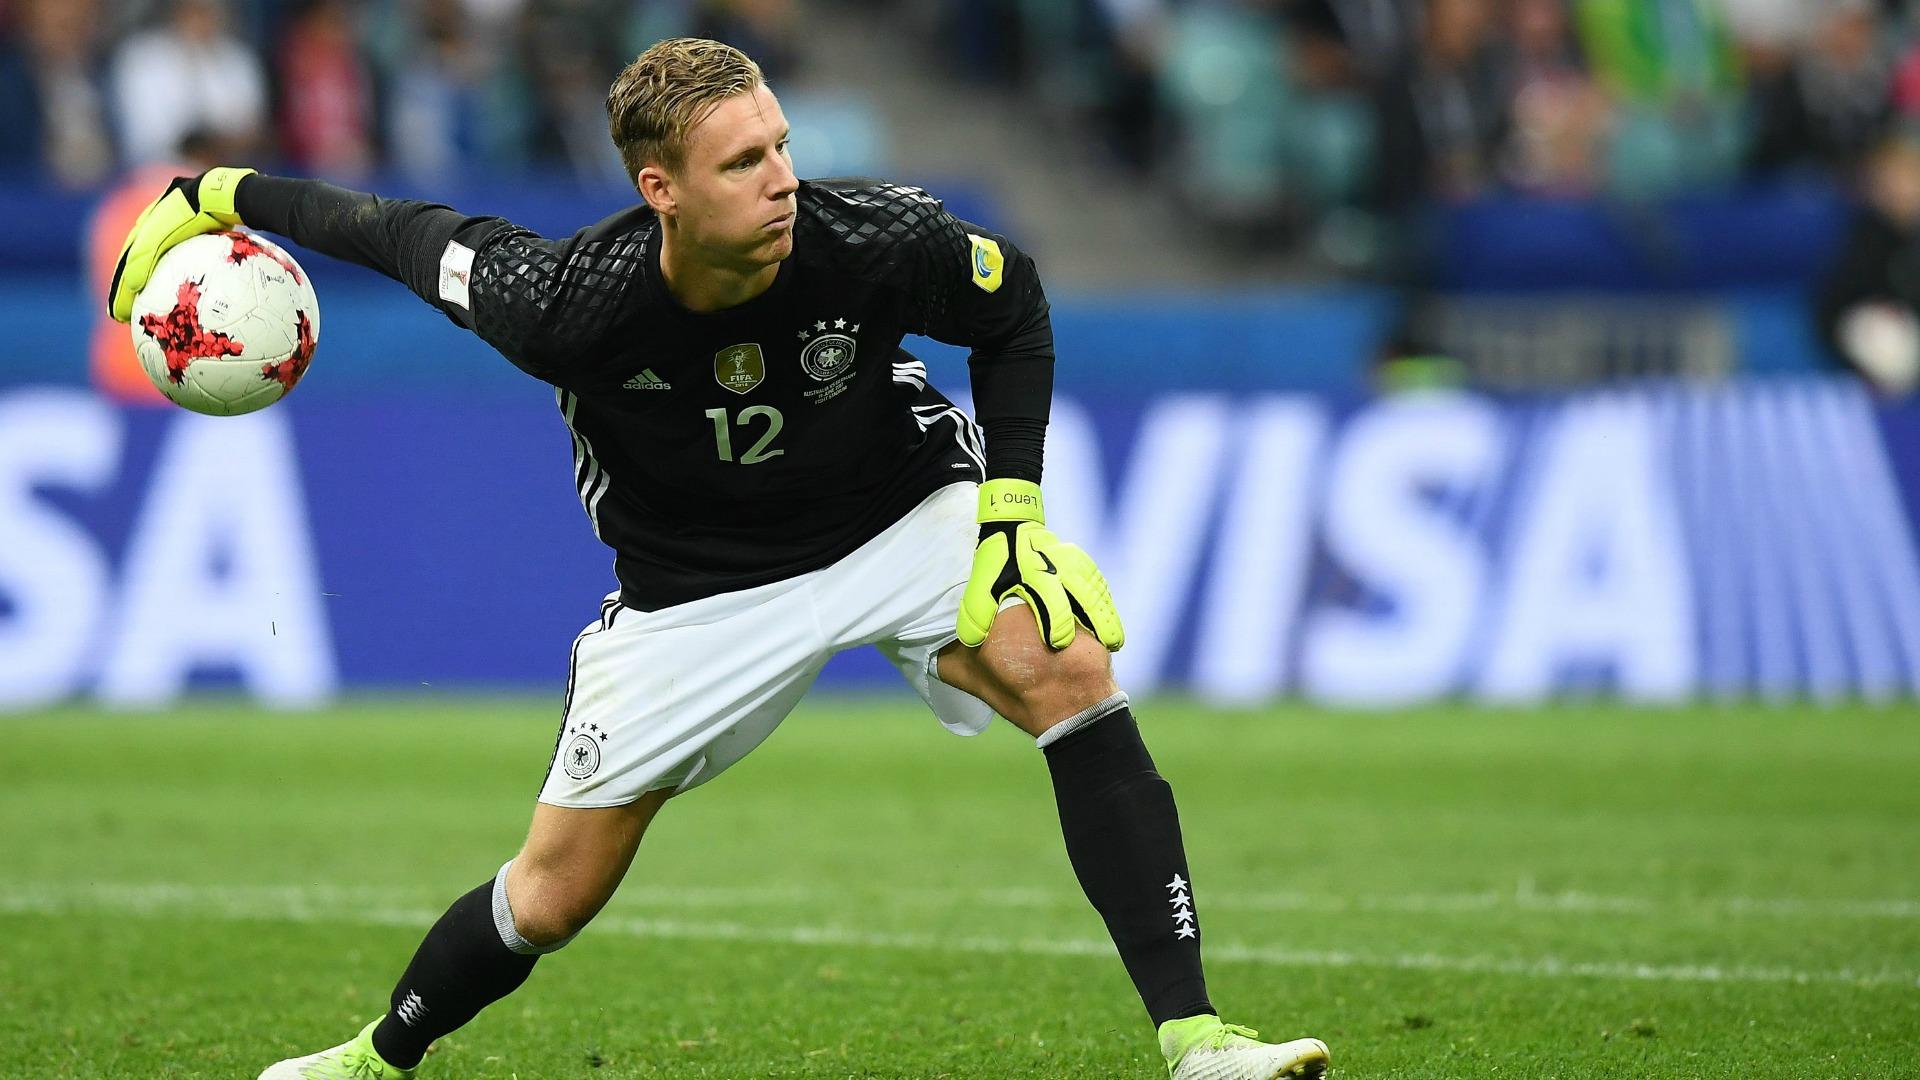 Bernd Leno Bayer Leverkusen Germany